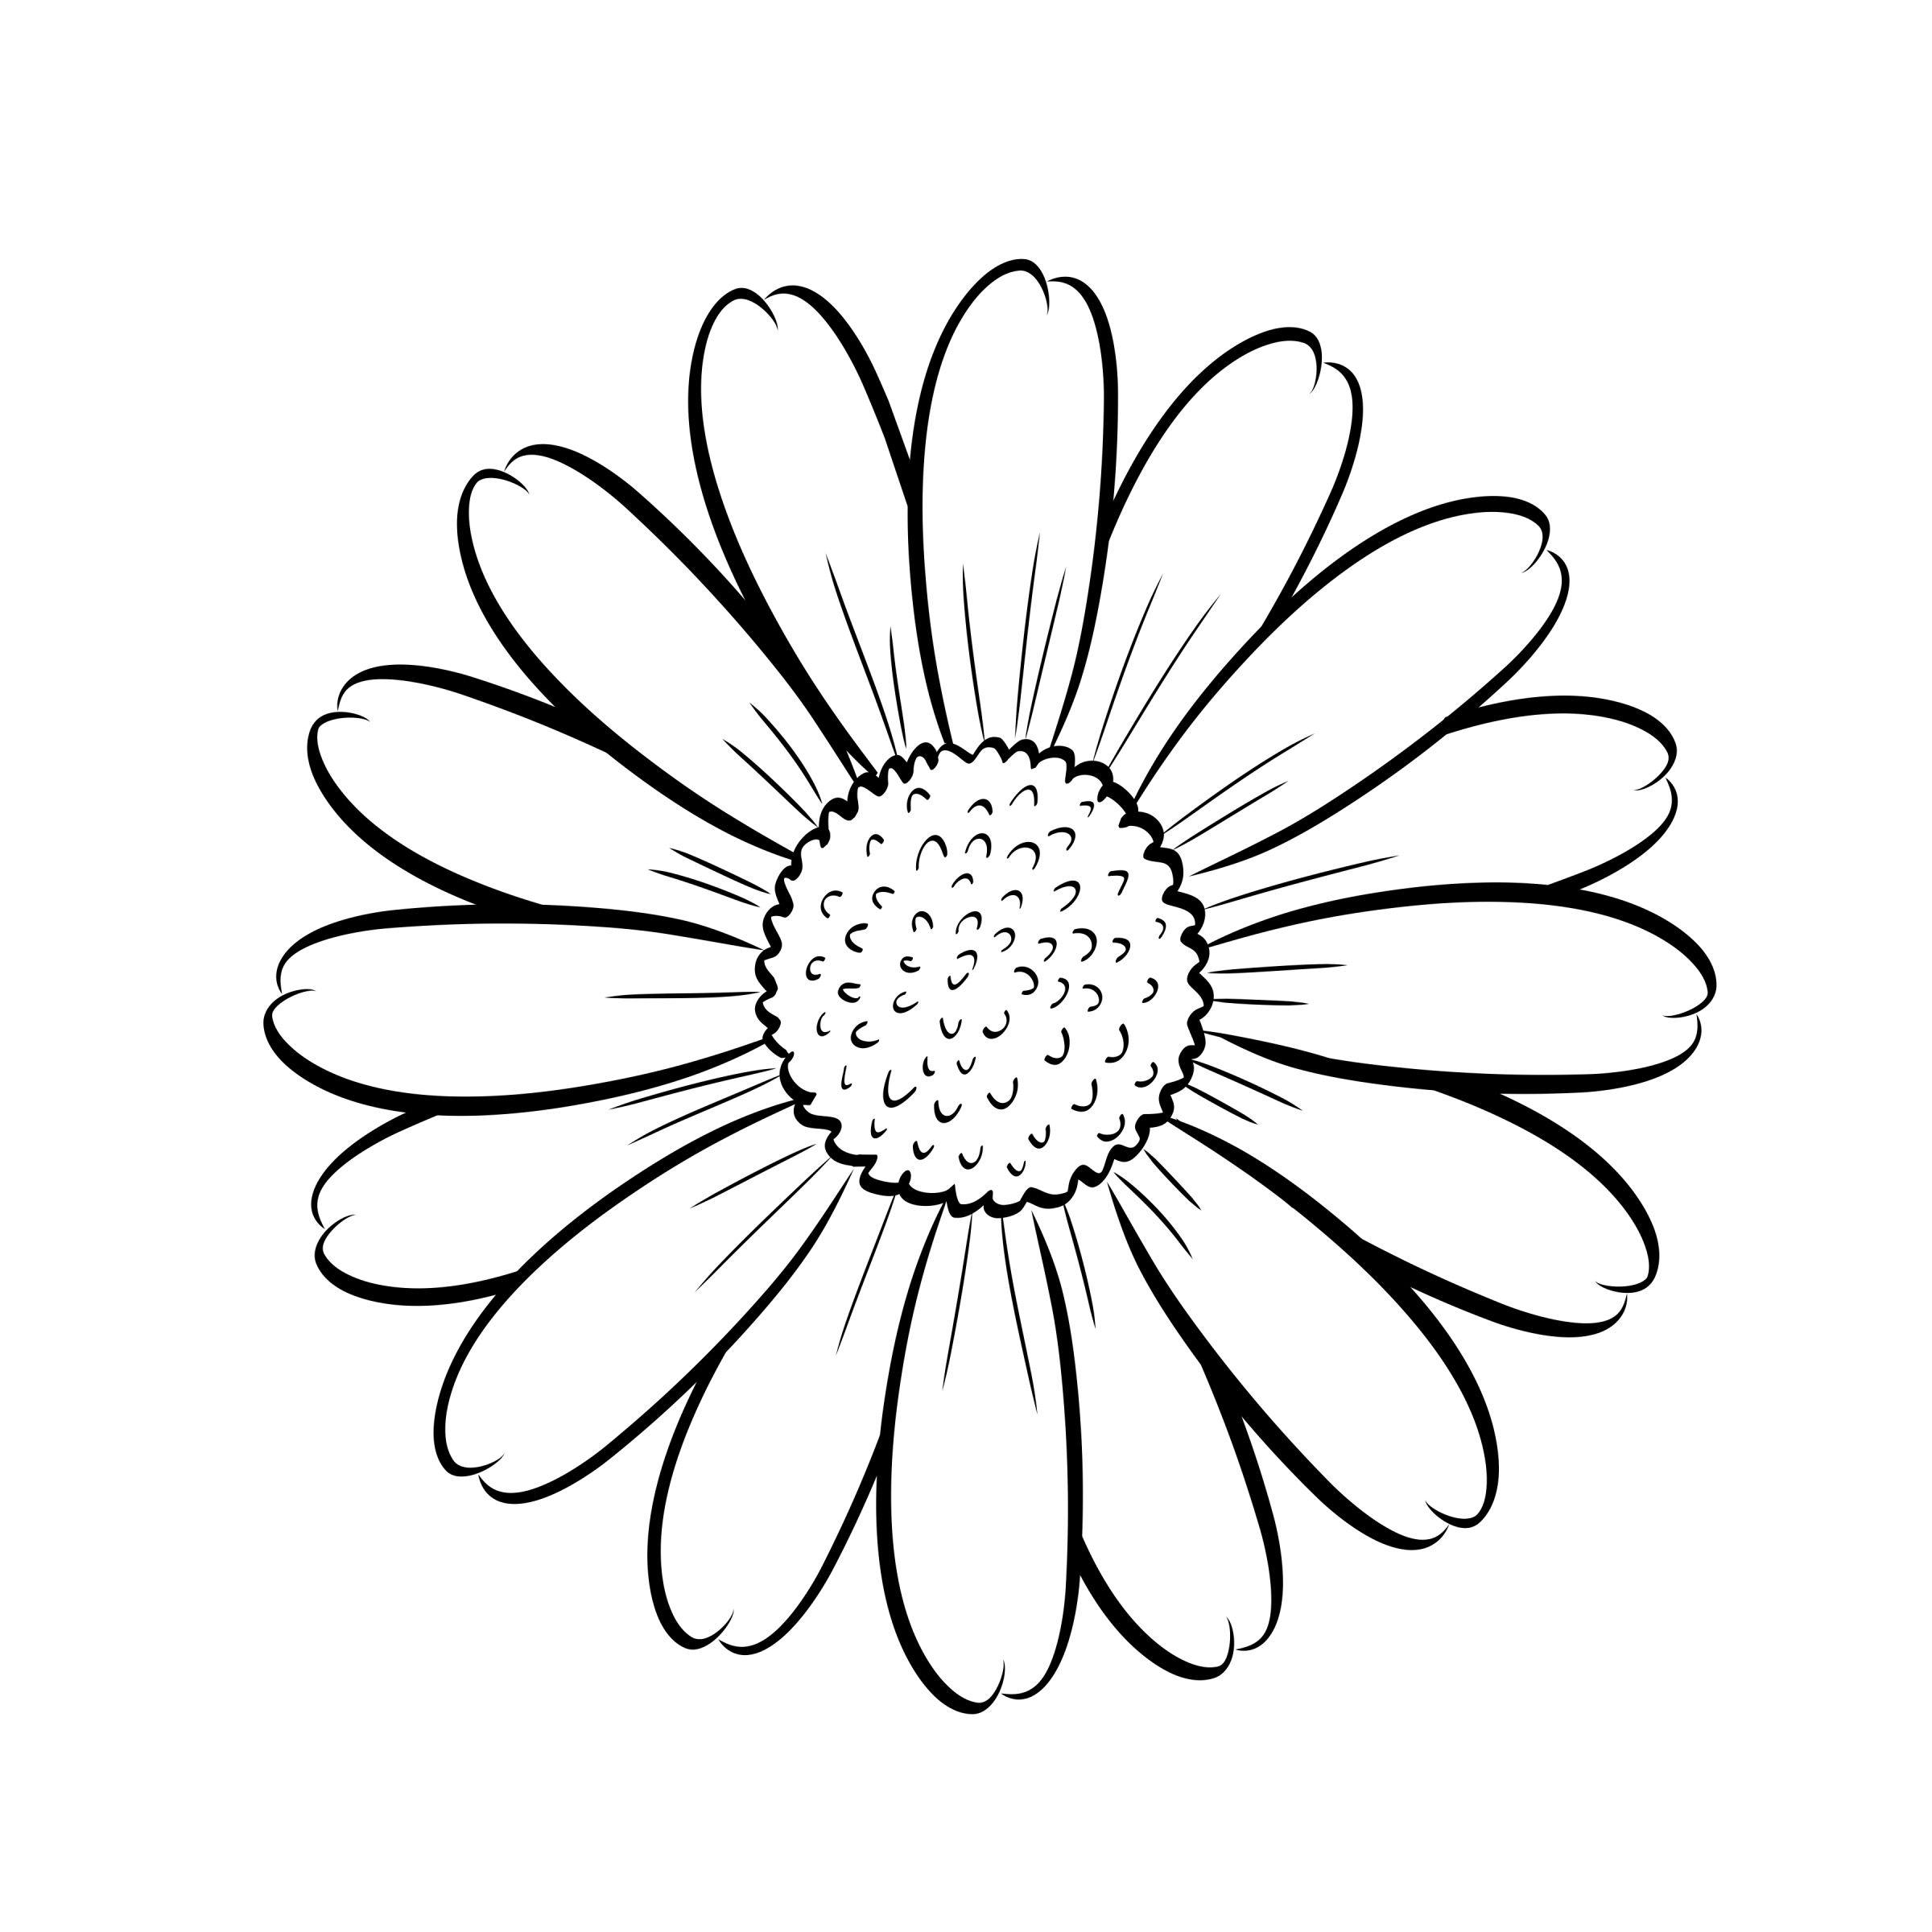 Pin od ela quba na kwiaty pinterest daisy drawing - Coloriage marguerite ...